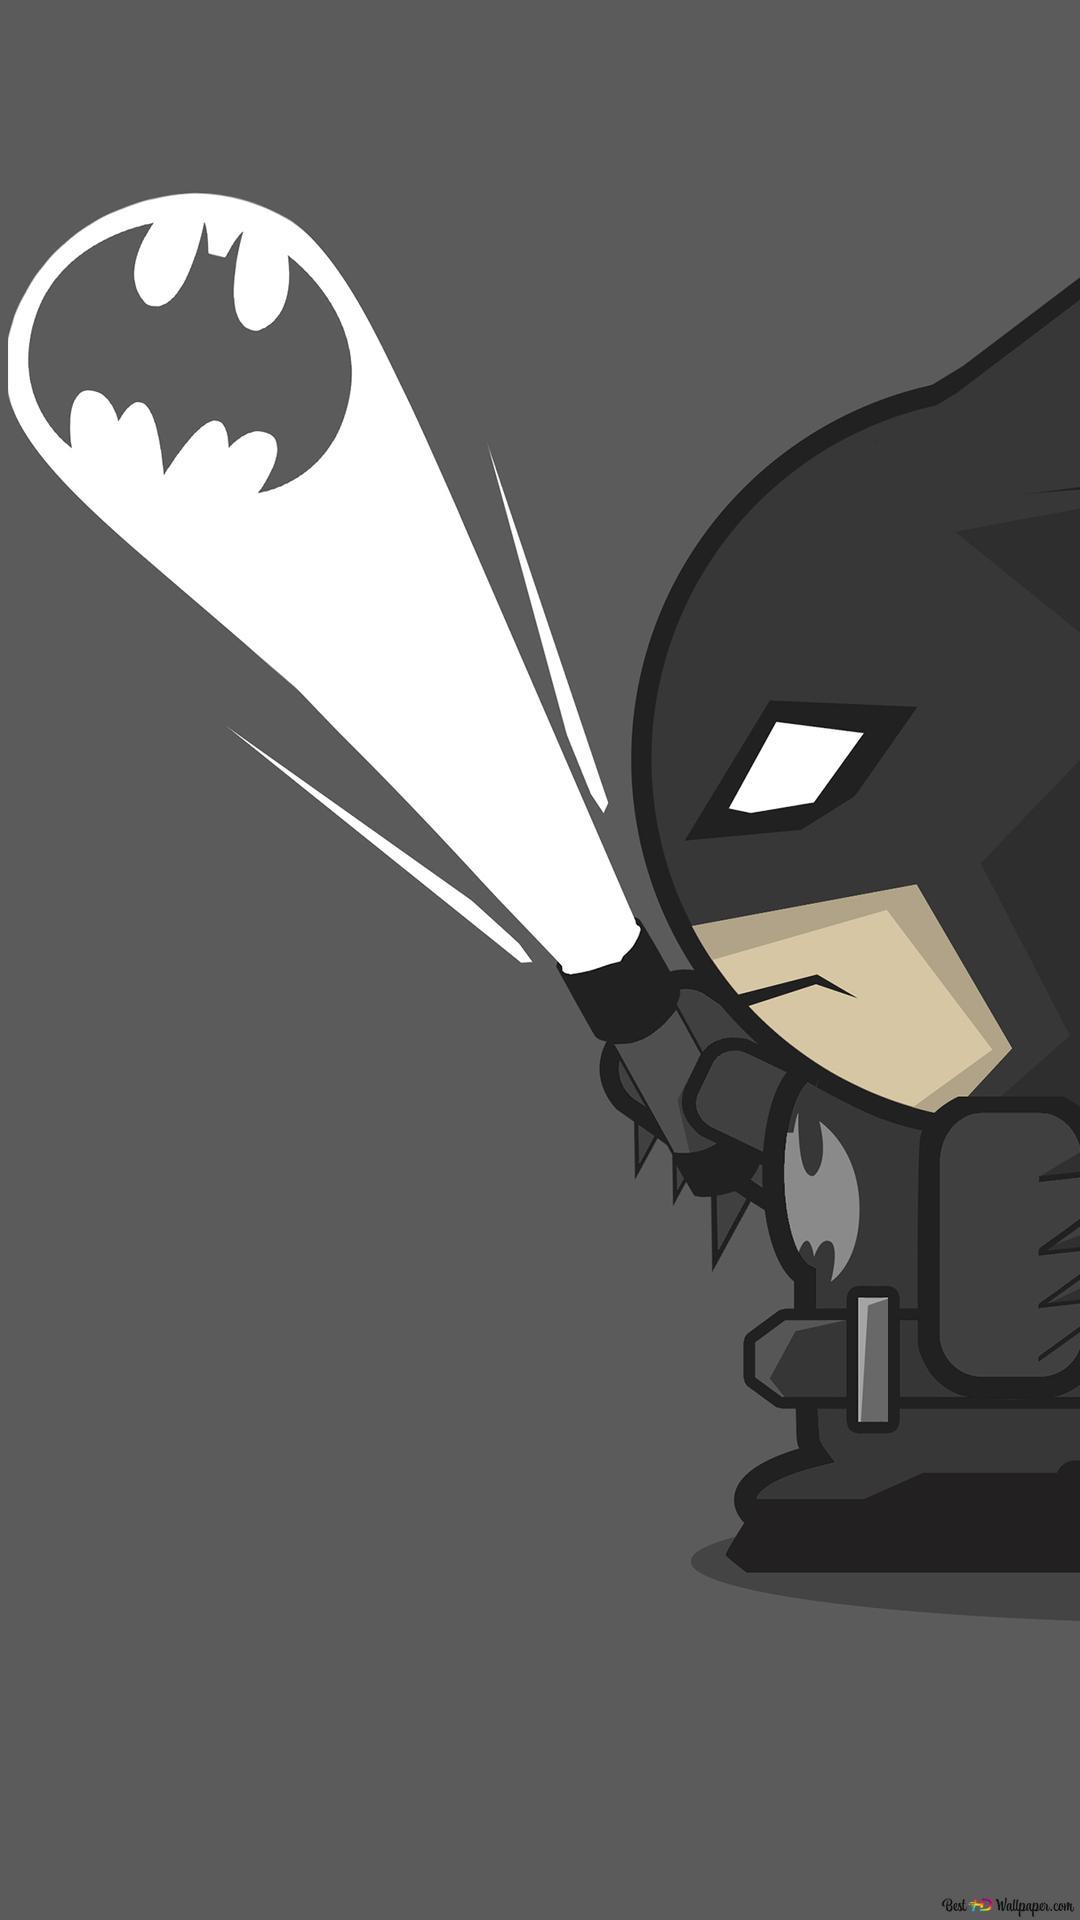 Chibi Batman Hd Wallpaper Download